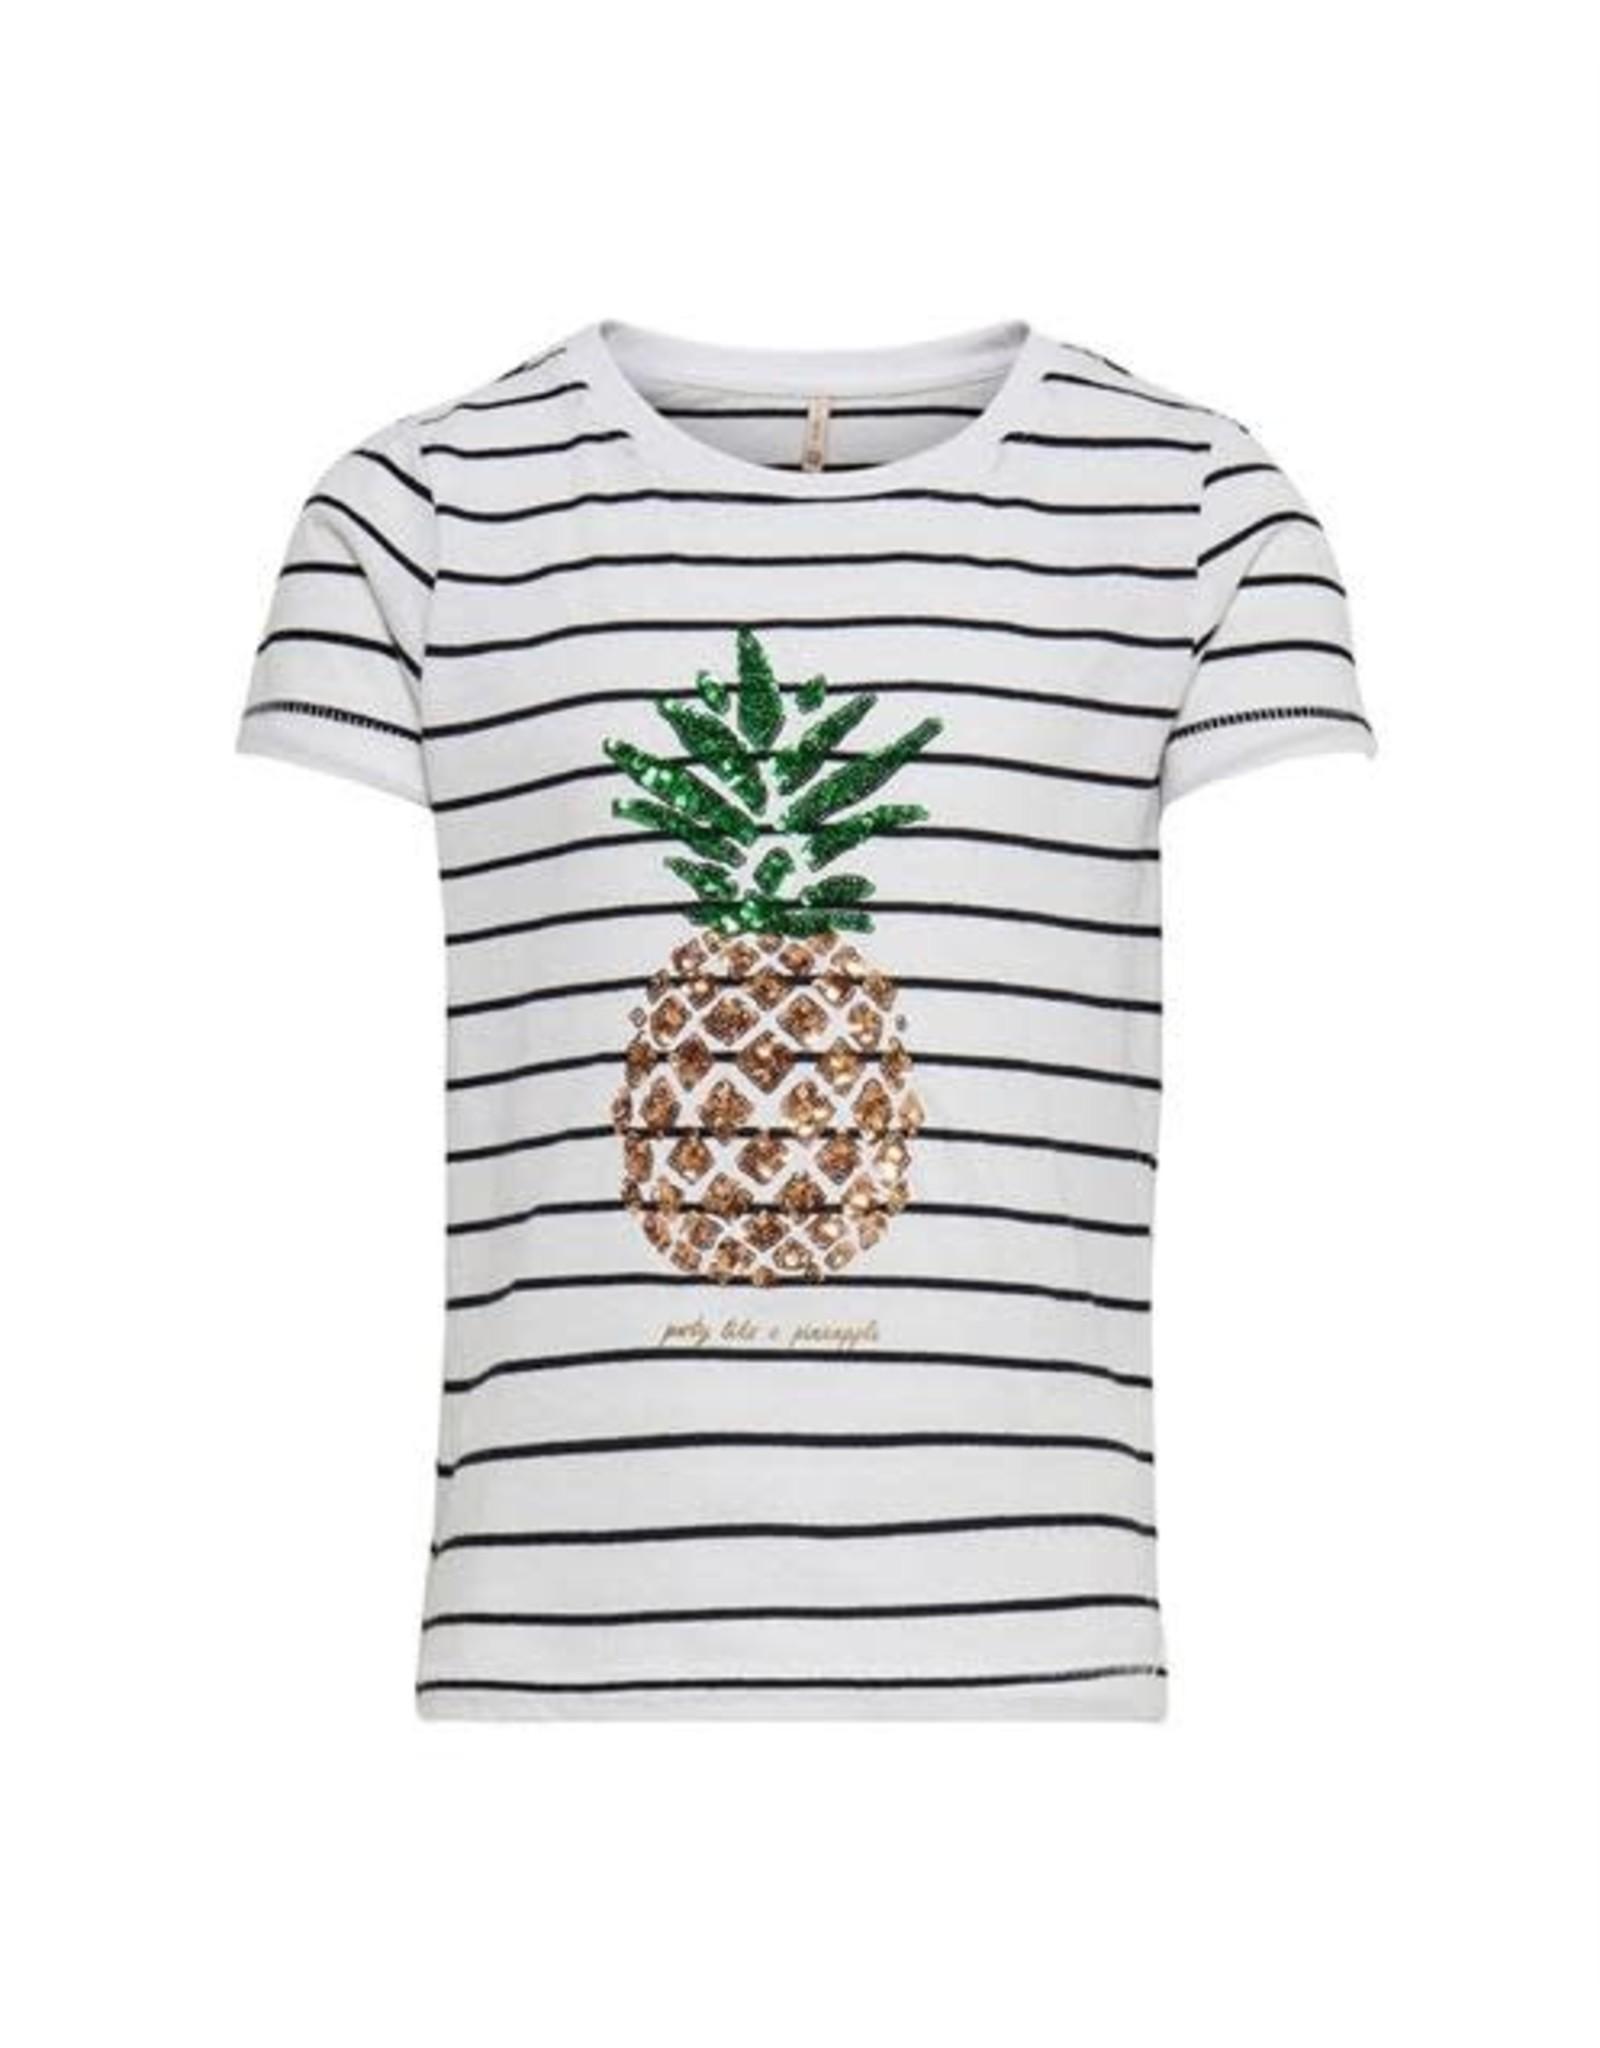 KIDS ONLY Gestreepte -shirt met glitter ananas